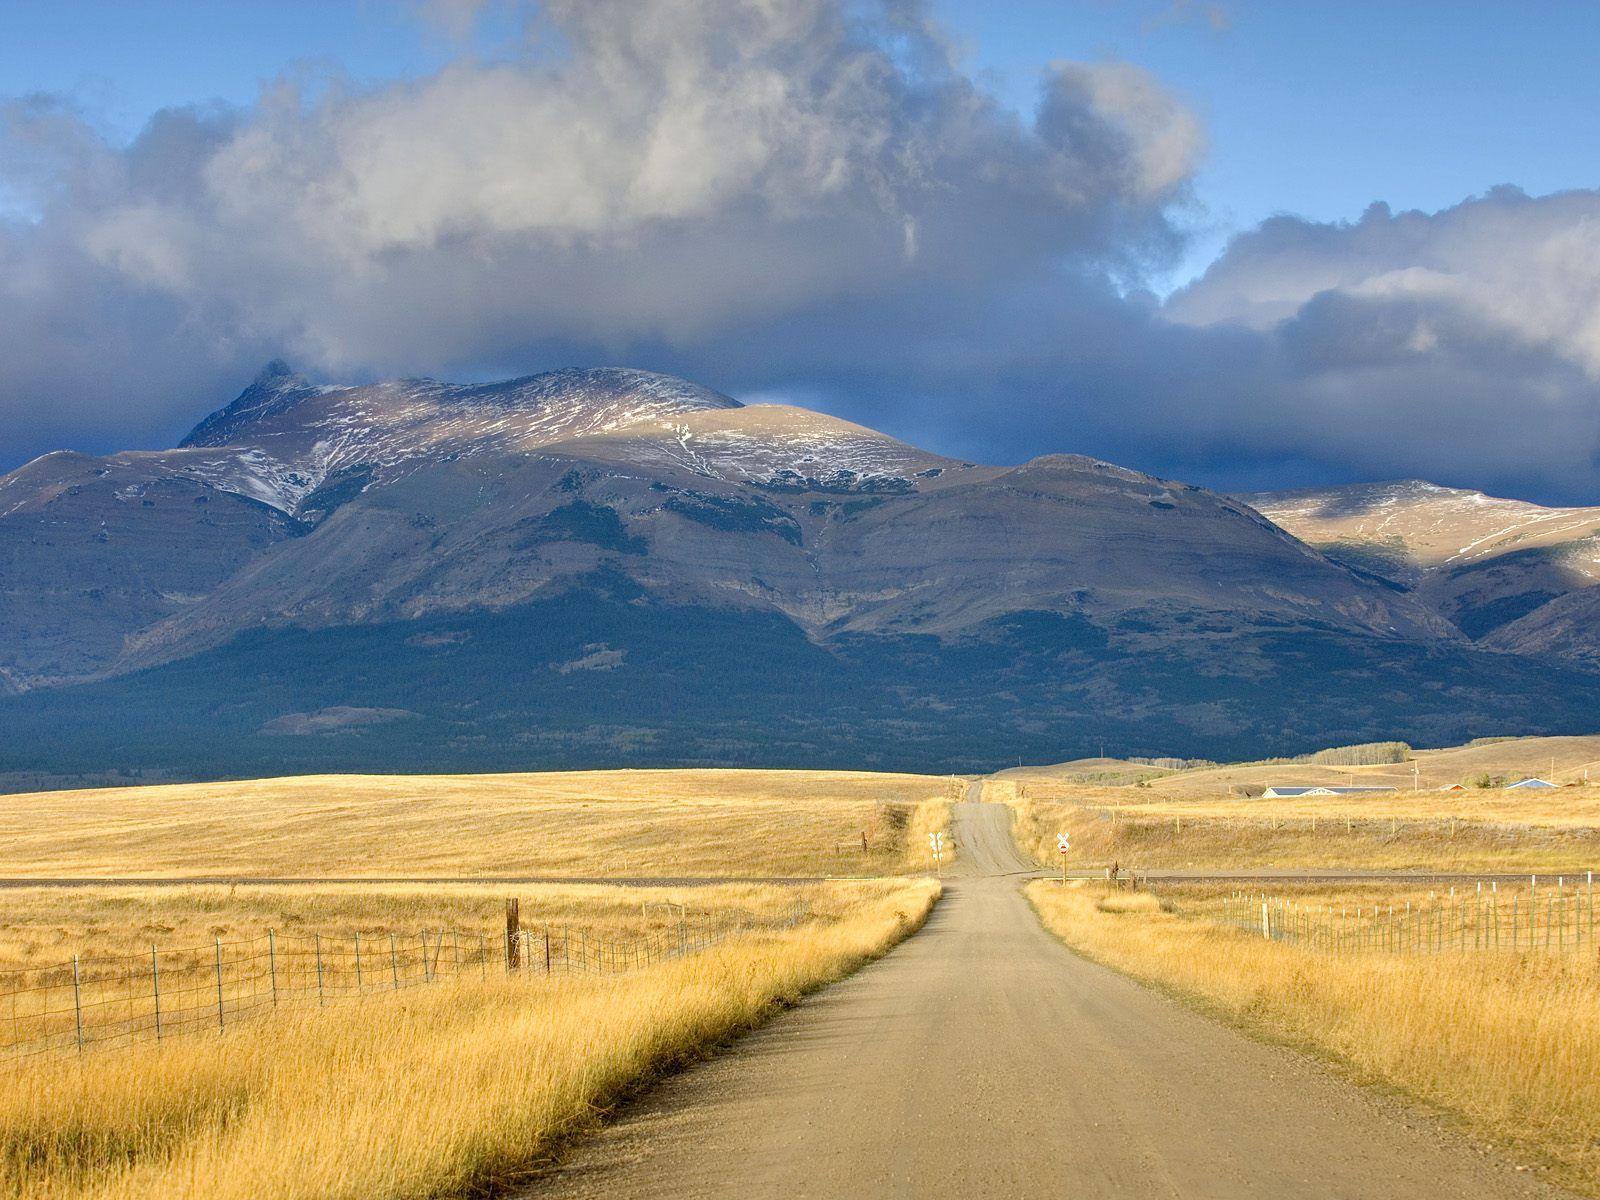 The Montana Plains Near Glacier National Park Montana in full screen 1600x1200